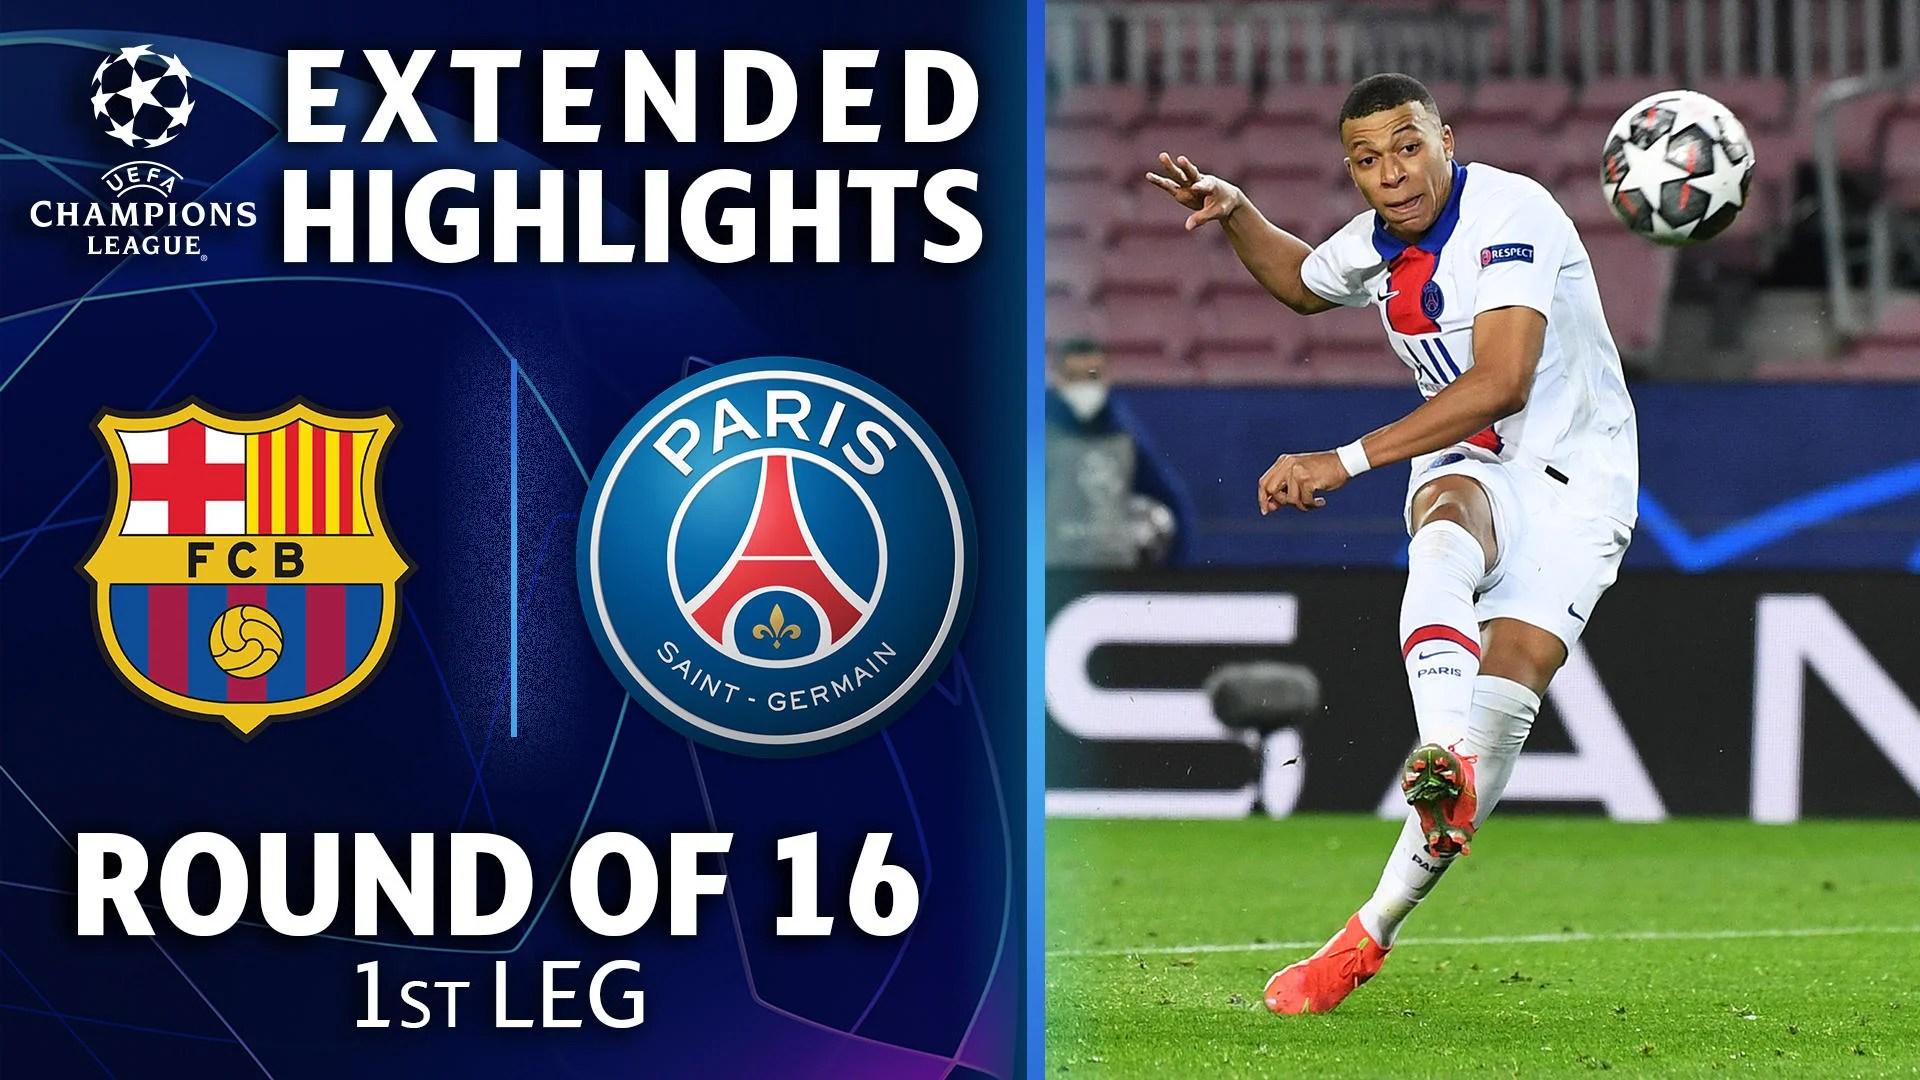 barcelona vs paris saint germain extended highlights cbssports com